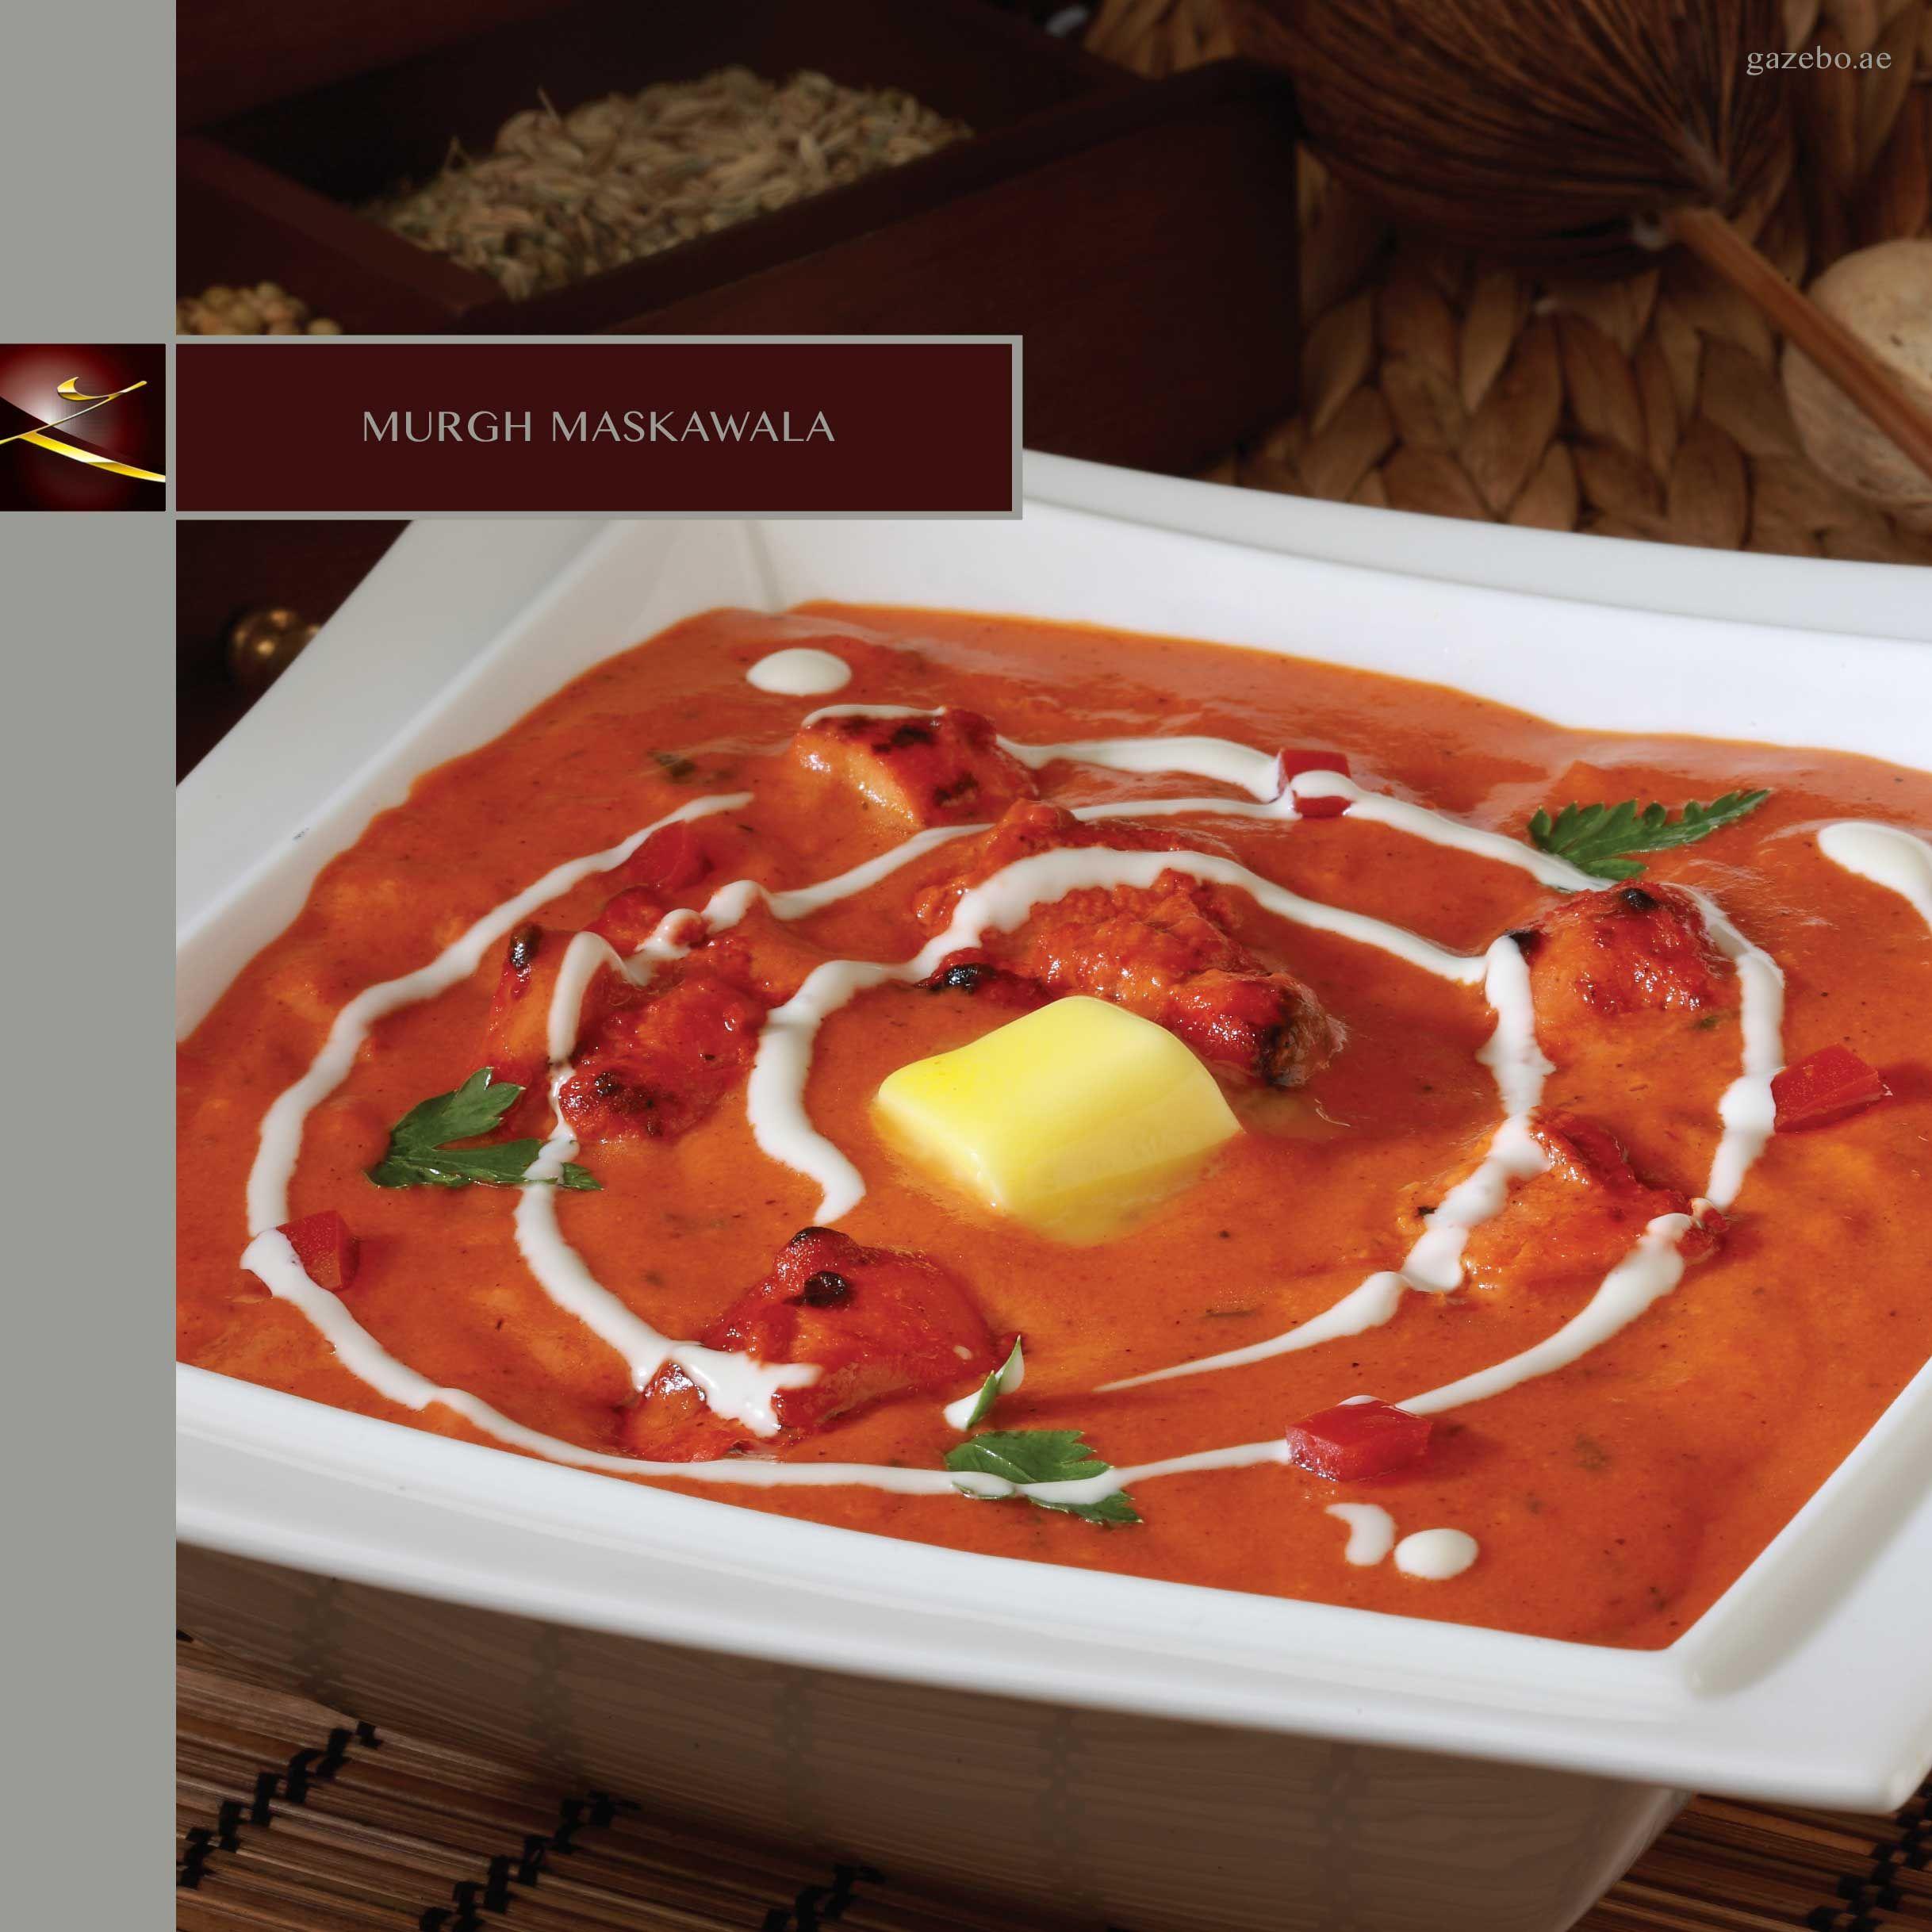 Creamy Deliciousness Indiancuisine Uae Dubai Abudhabi Sharjah Ajman Alain Rasalkhaimah Dubai Food Indian Food Recipes Indian Cuisine